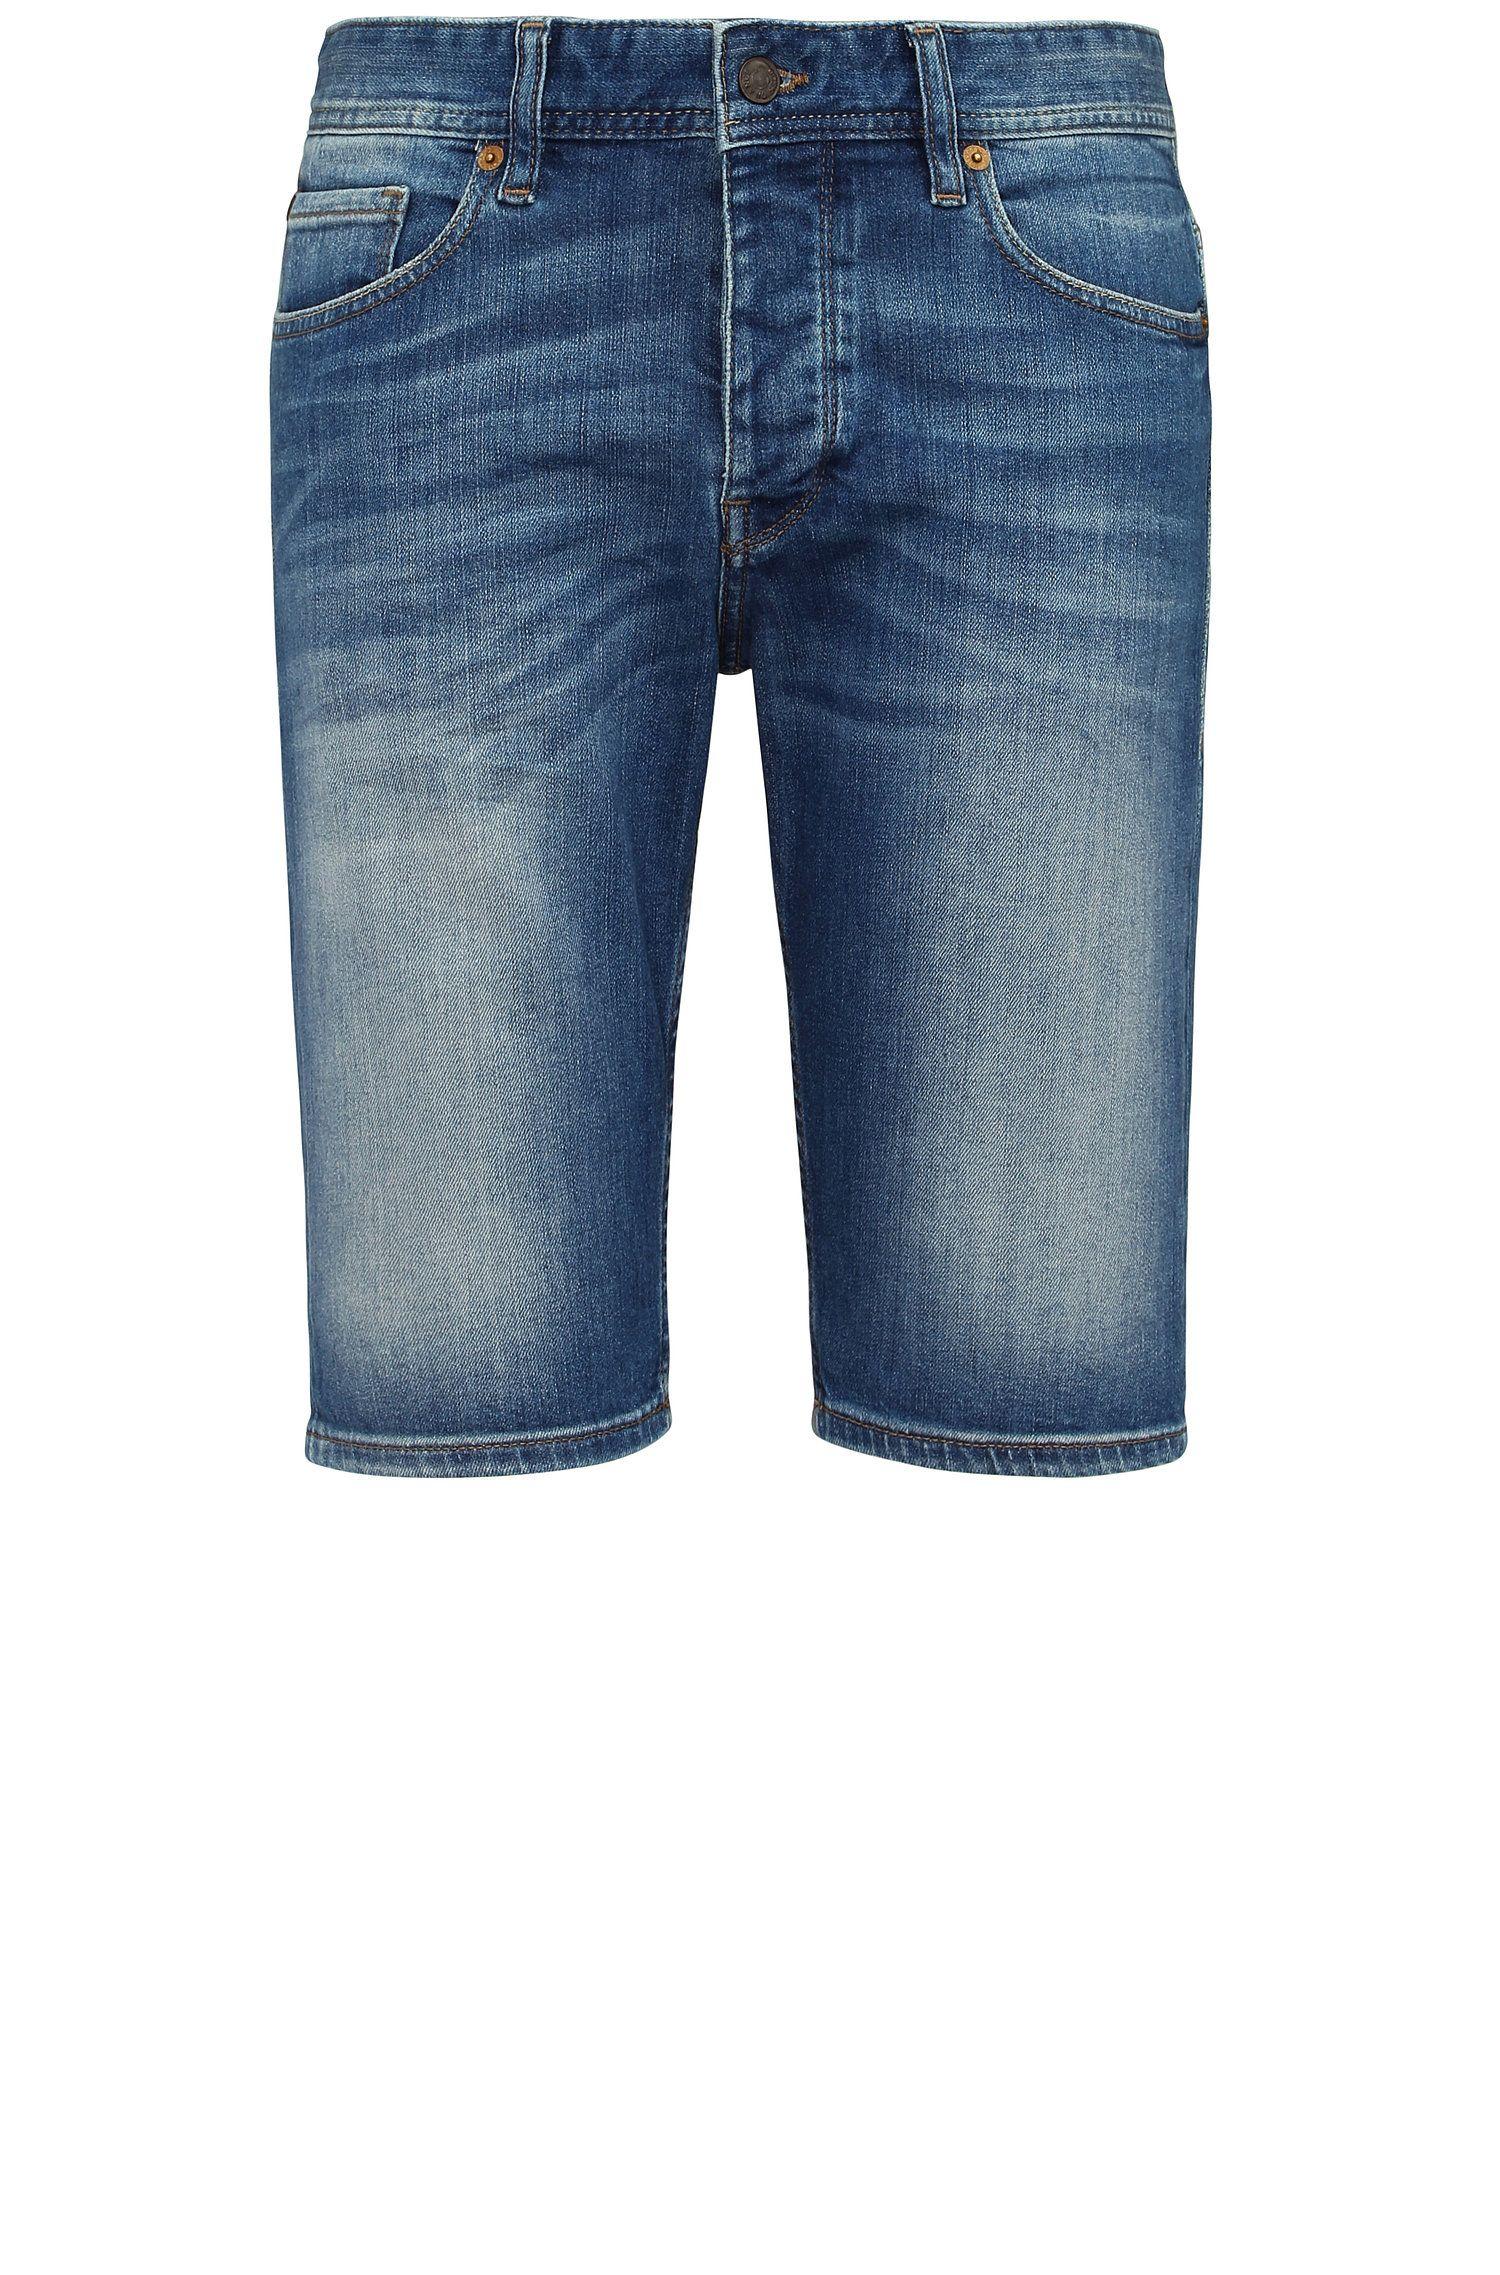 'Orange 90 Short' | Stretch Cotton, 11 oz Denim Shorts